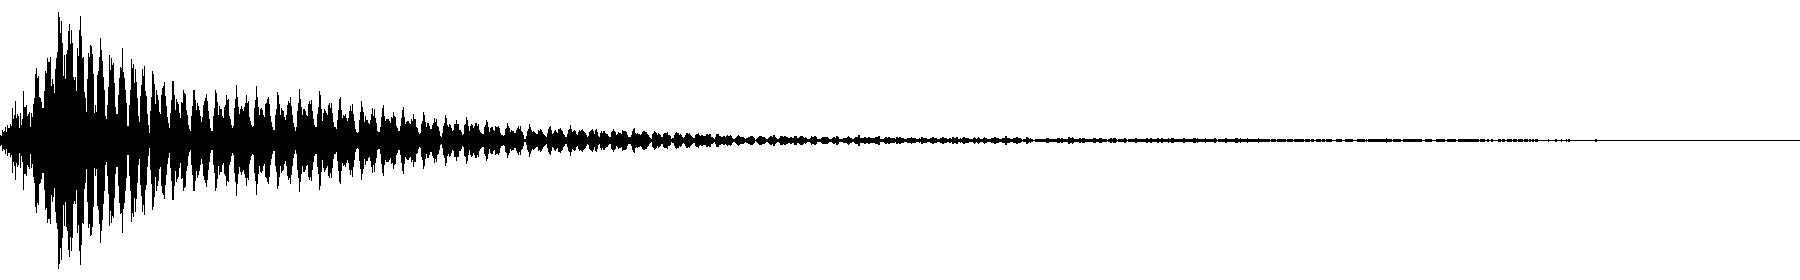 vedh synth cut 098 f